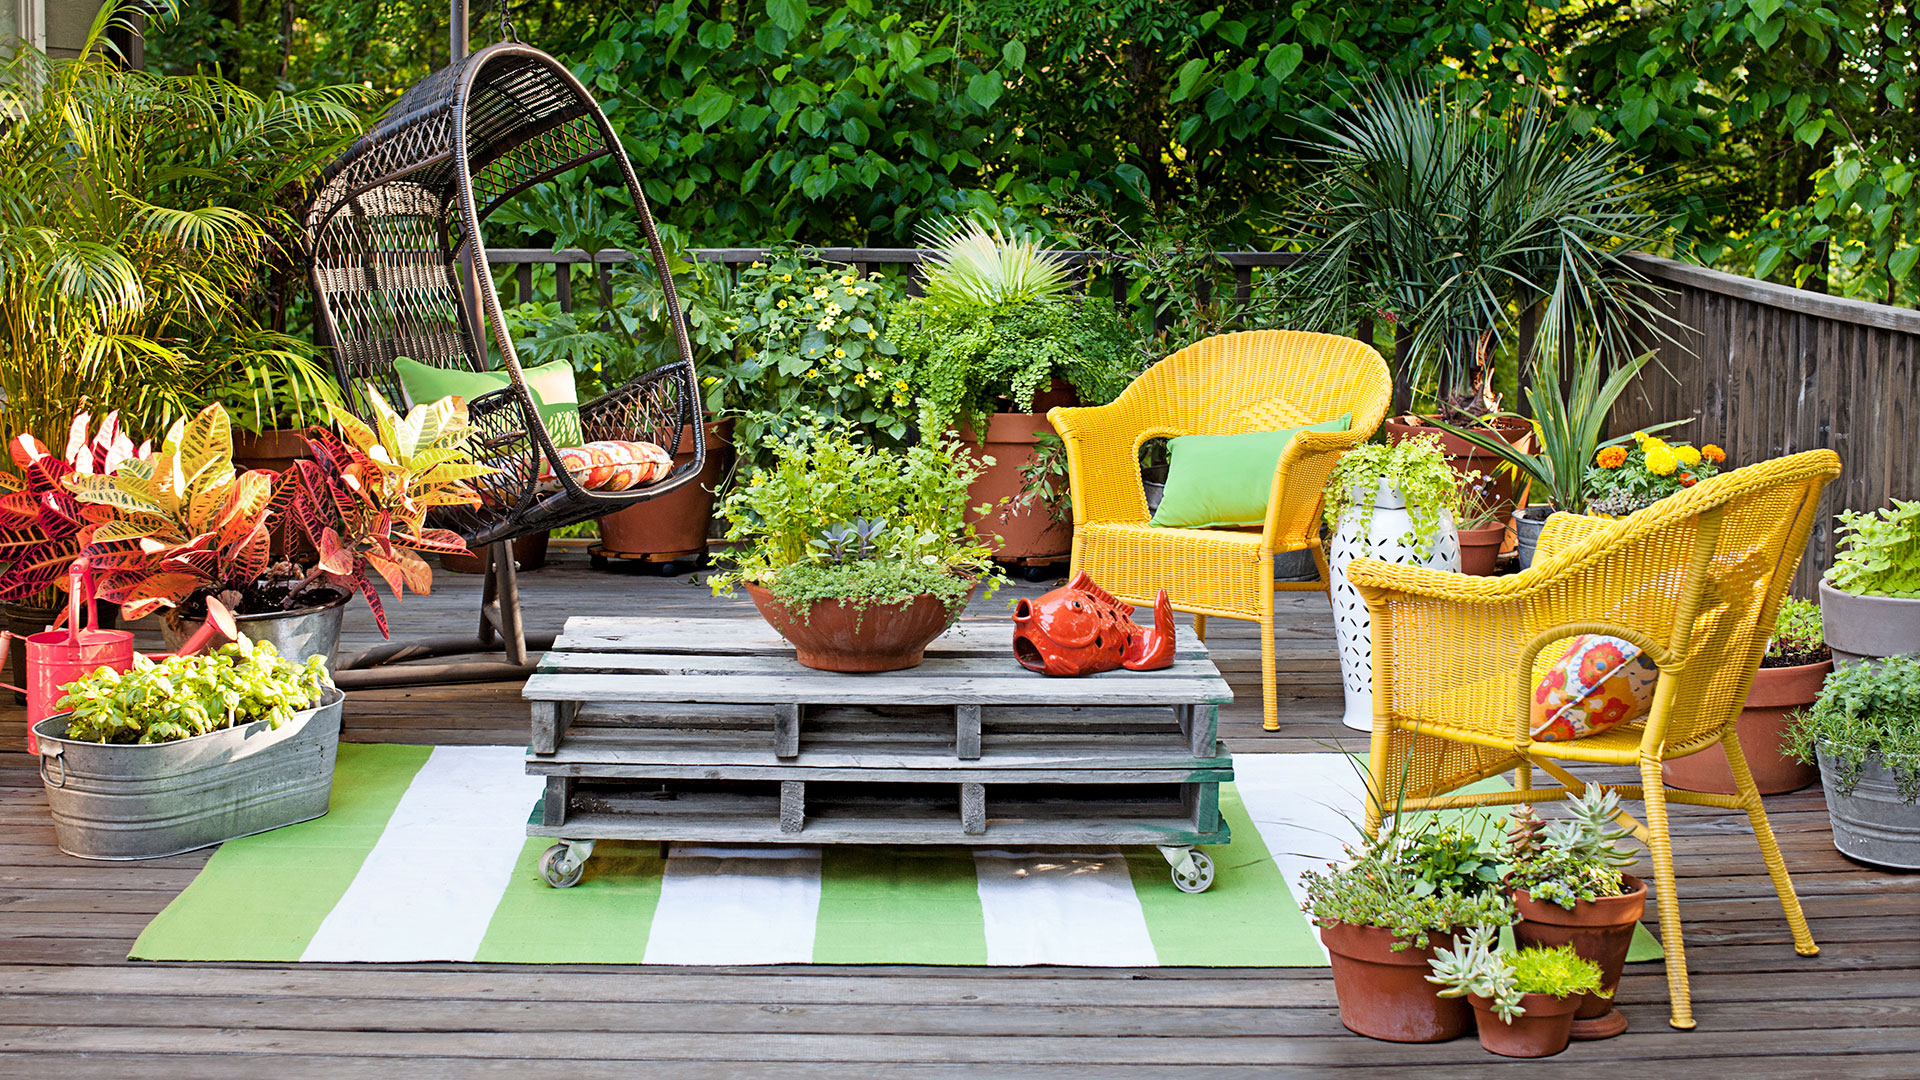 25 Backyard Decorating Ideas - Easy Gardening Tips and DIY ... on Easy Back Garden Ideas id=68224